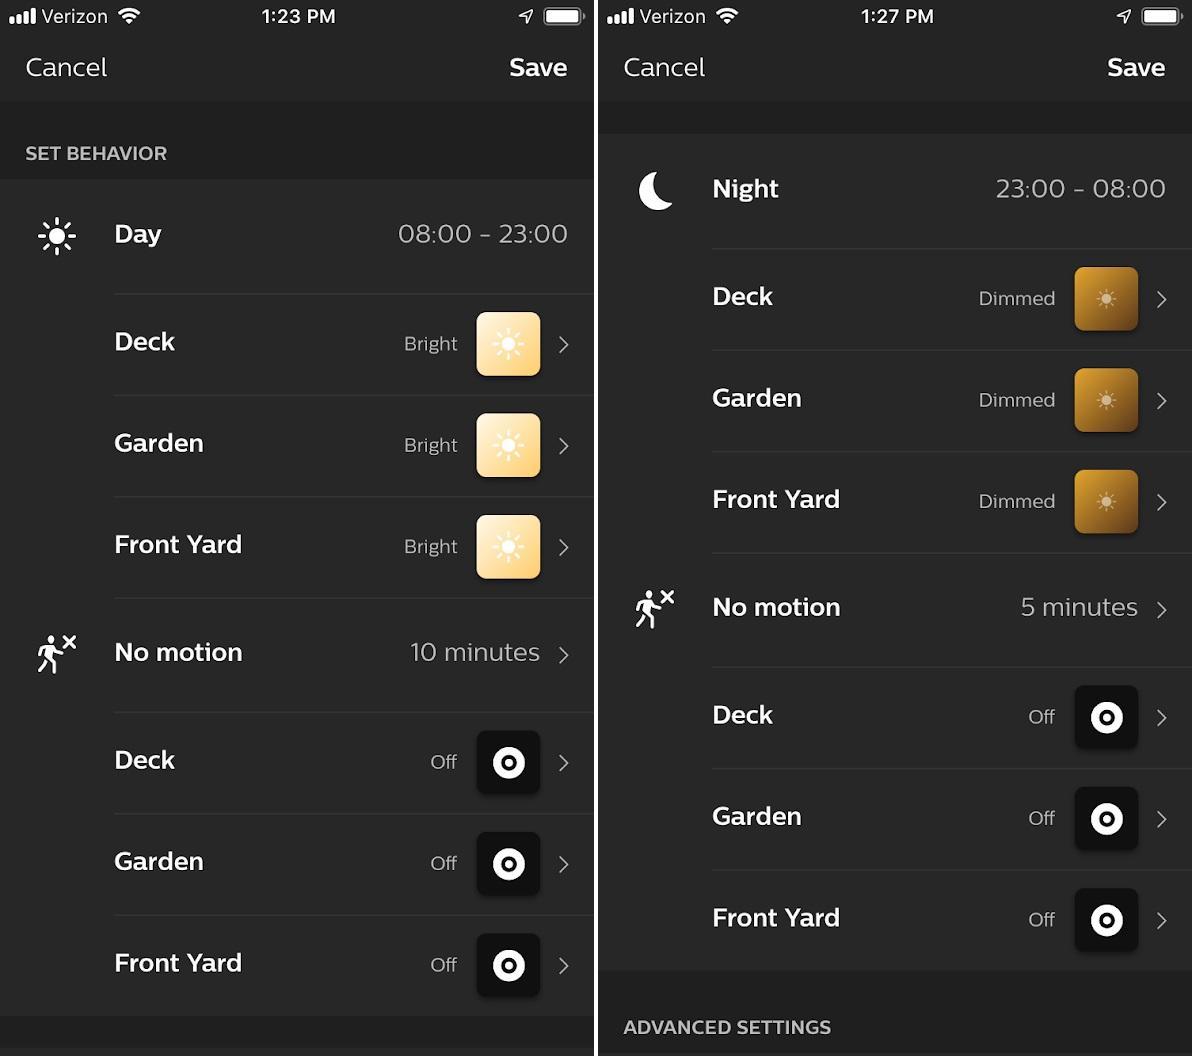 philips-hue-outdoor-sensor-app-settings